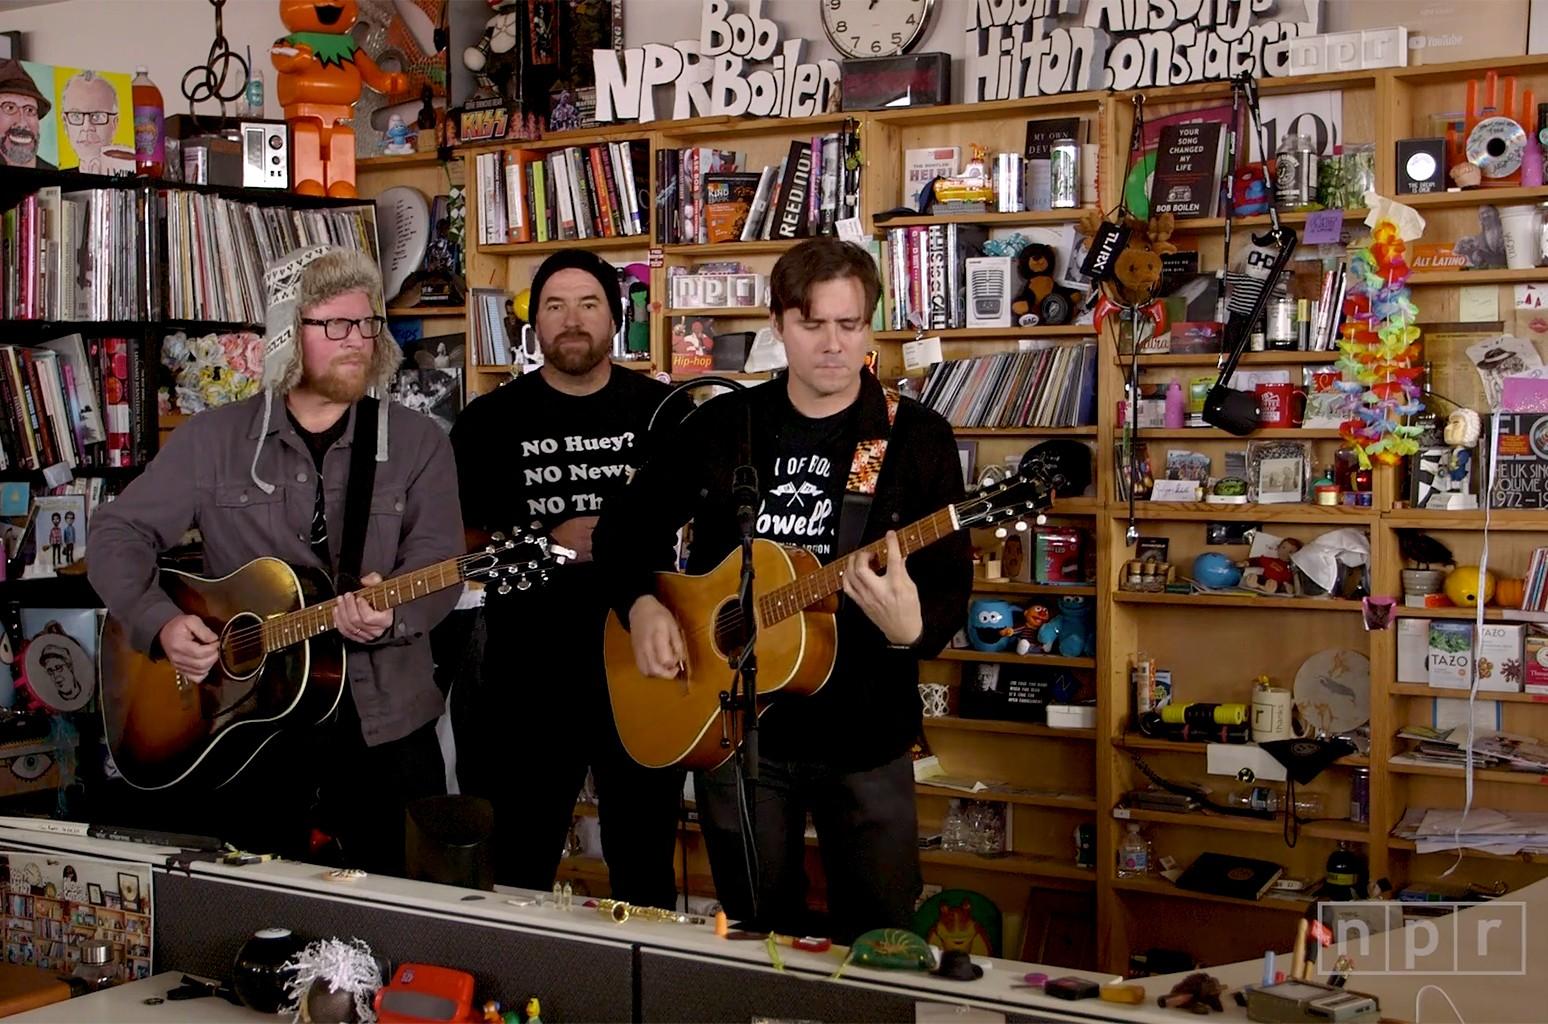 Jimmy Eat World perform on NPR's Tiny Desk Concert